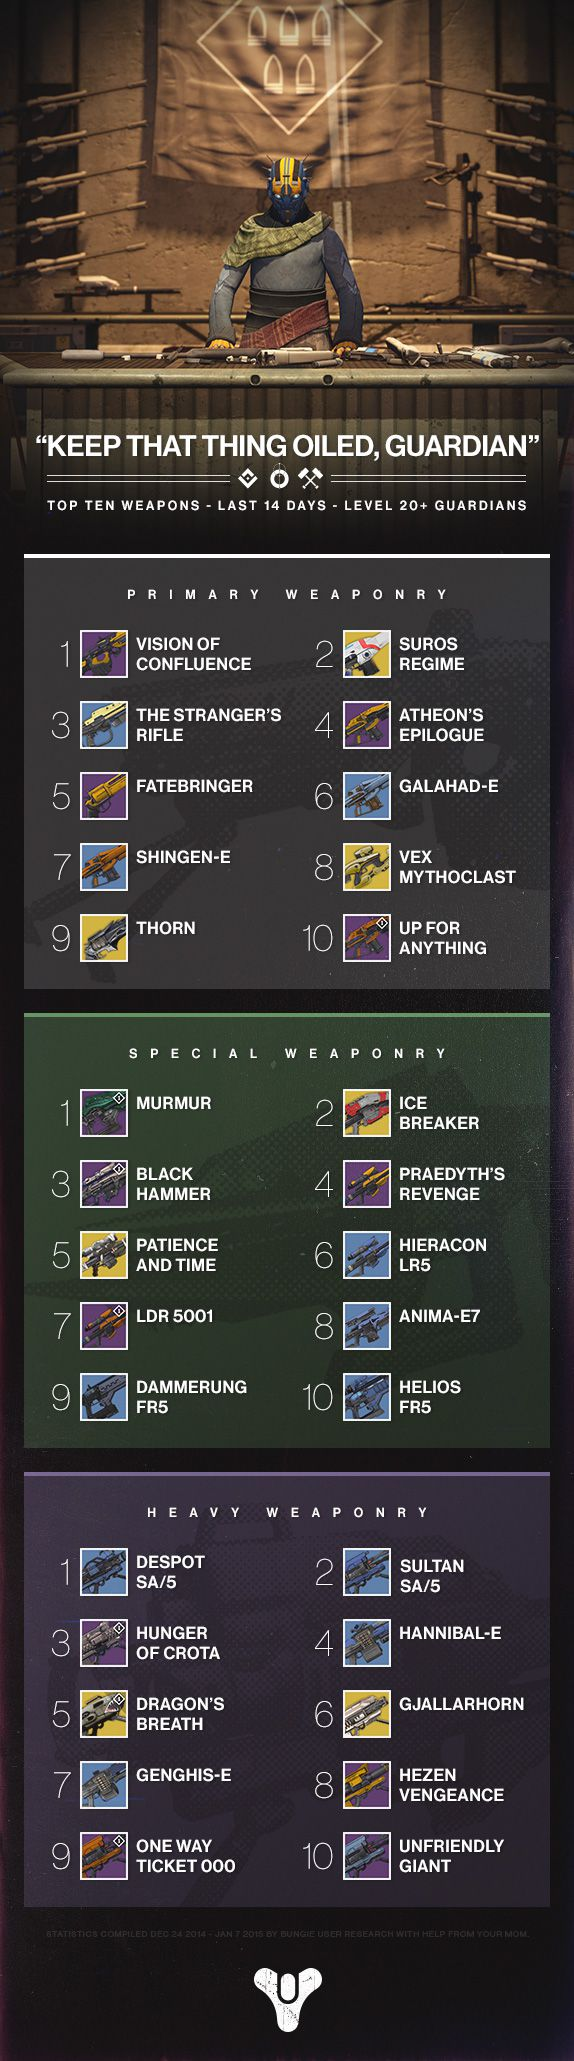 Destiny:BungieがPvE、PvPでの使用武器ランキングを発表